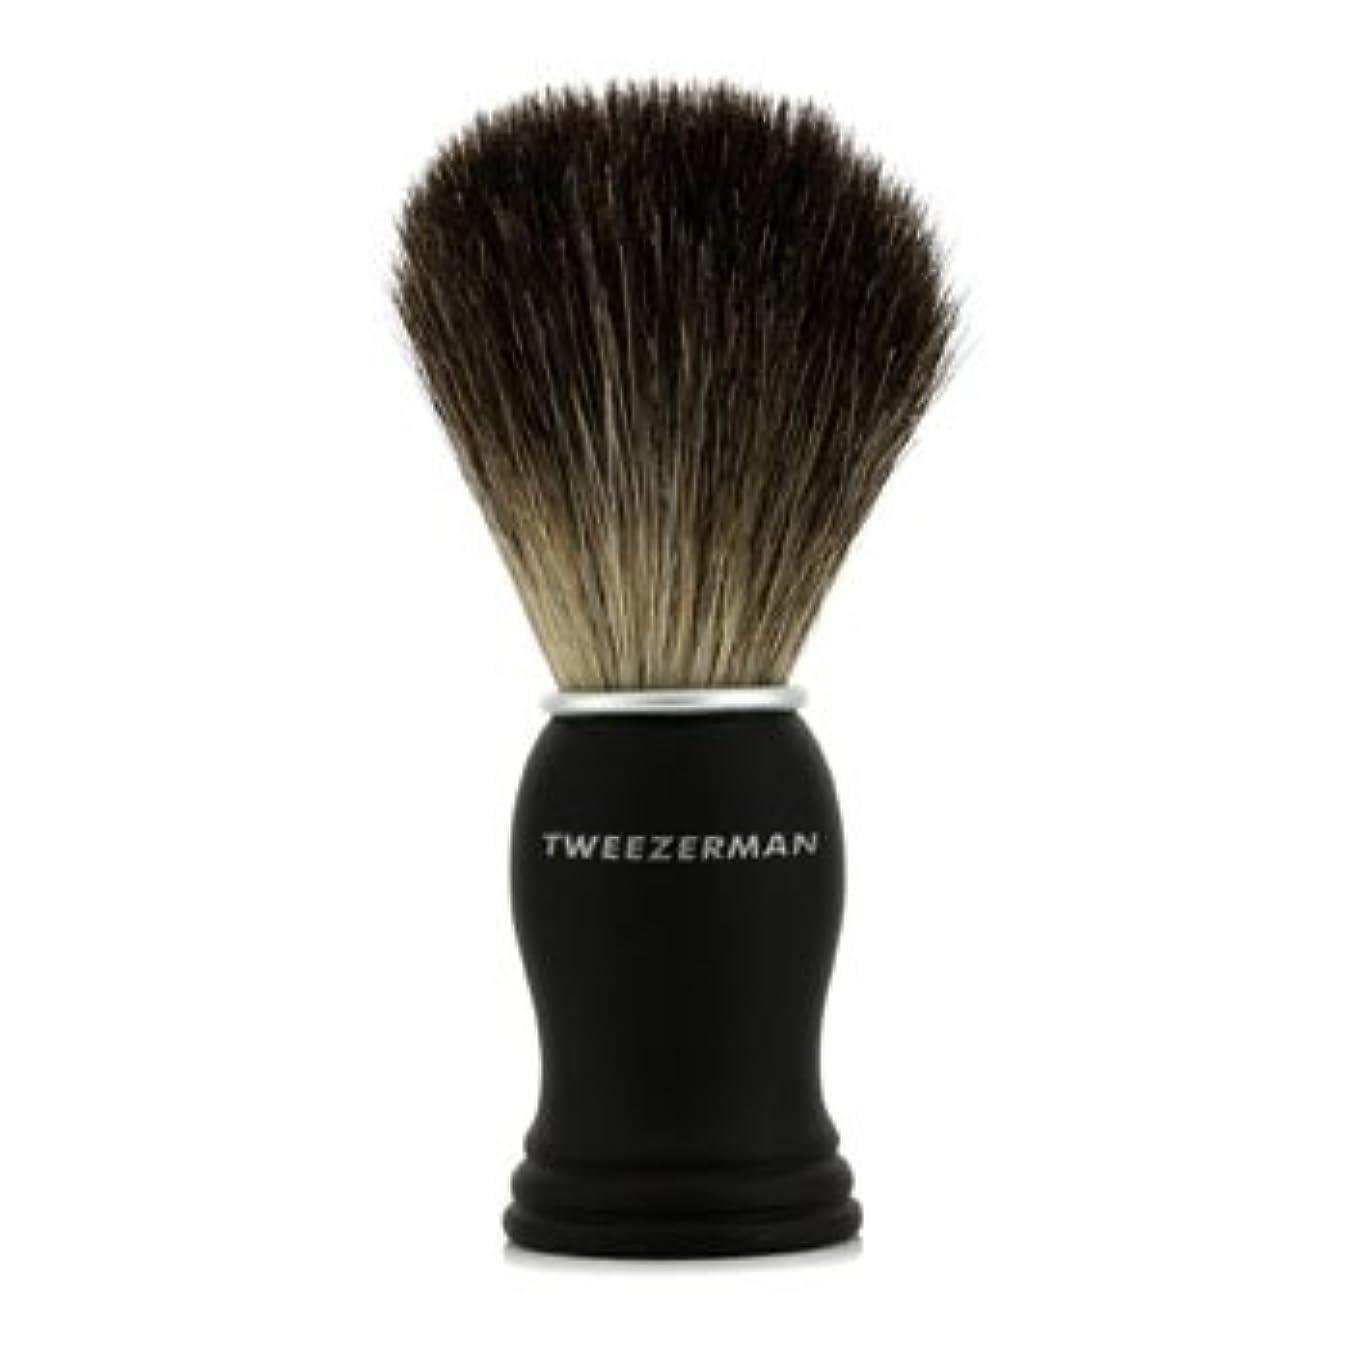 今忍耐意志[Tweezerman] Deluxe Shaving Brush 1pc